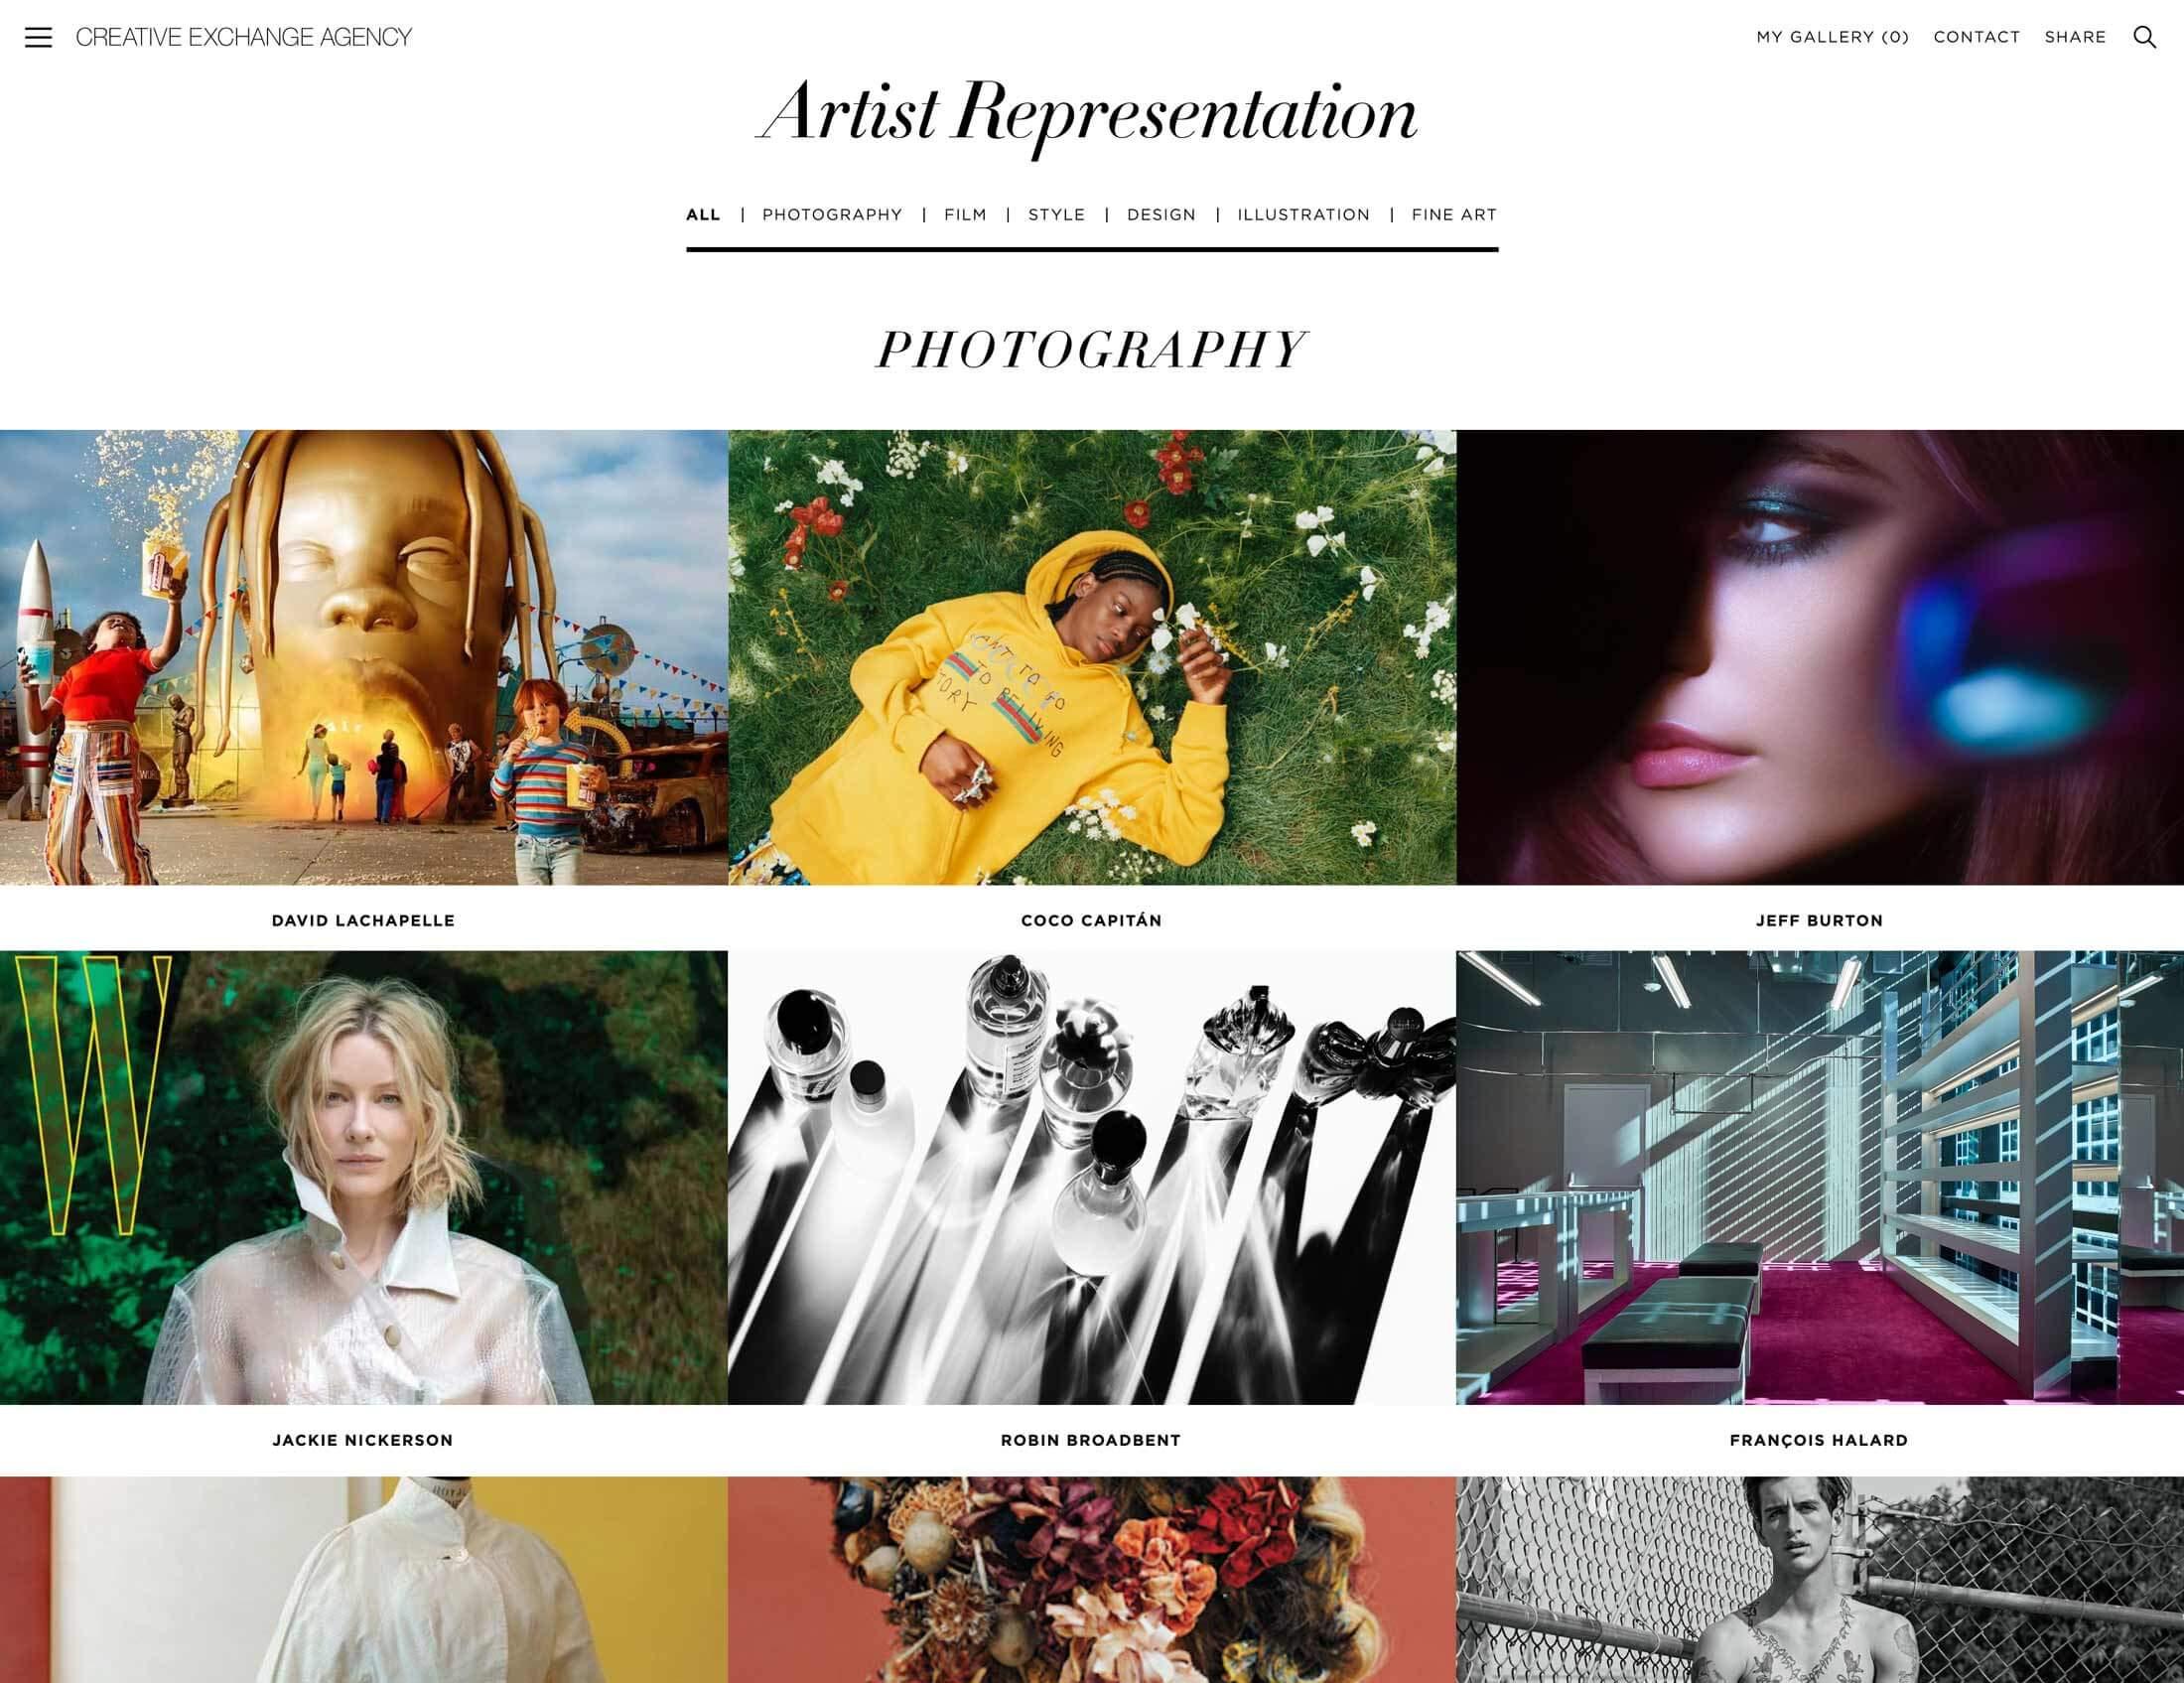 CXA_ArtistRepresentation